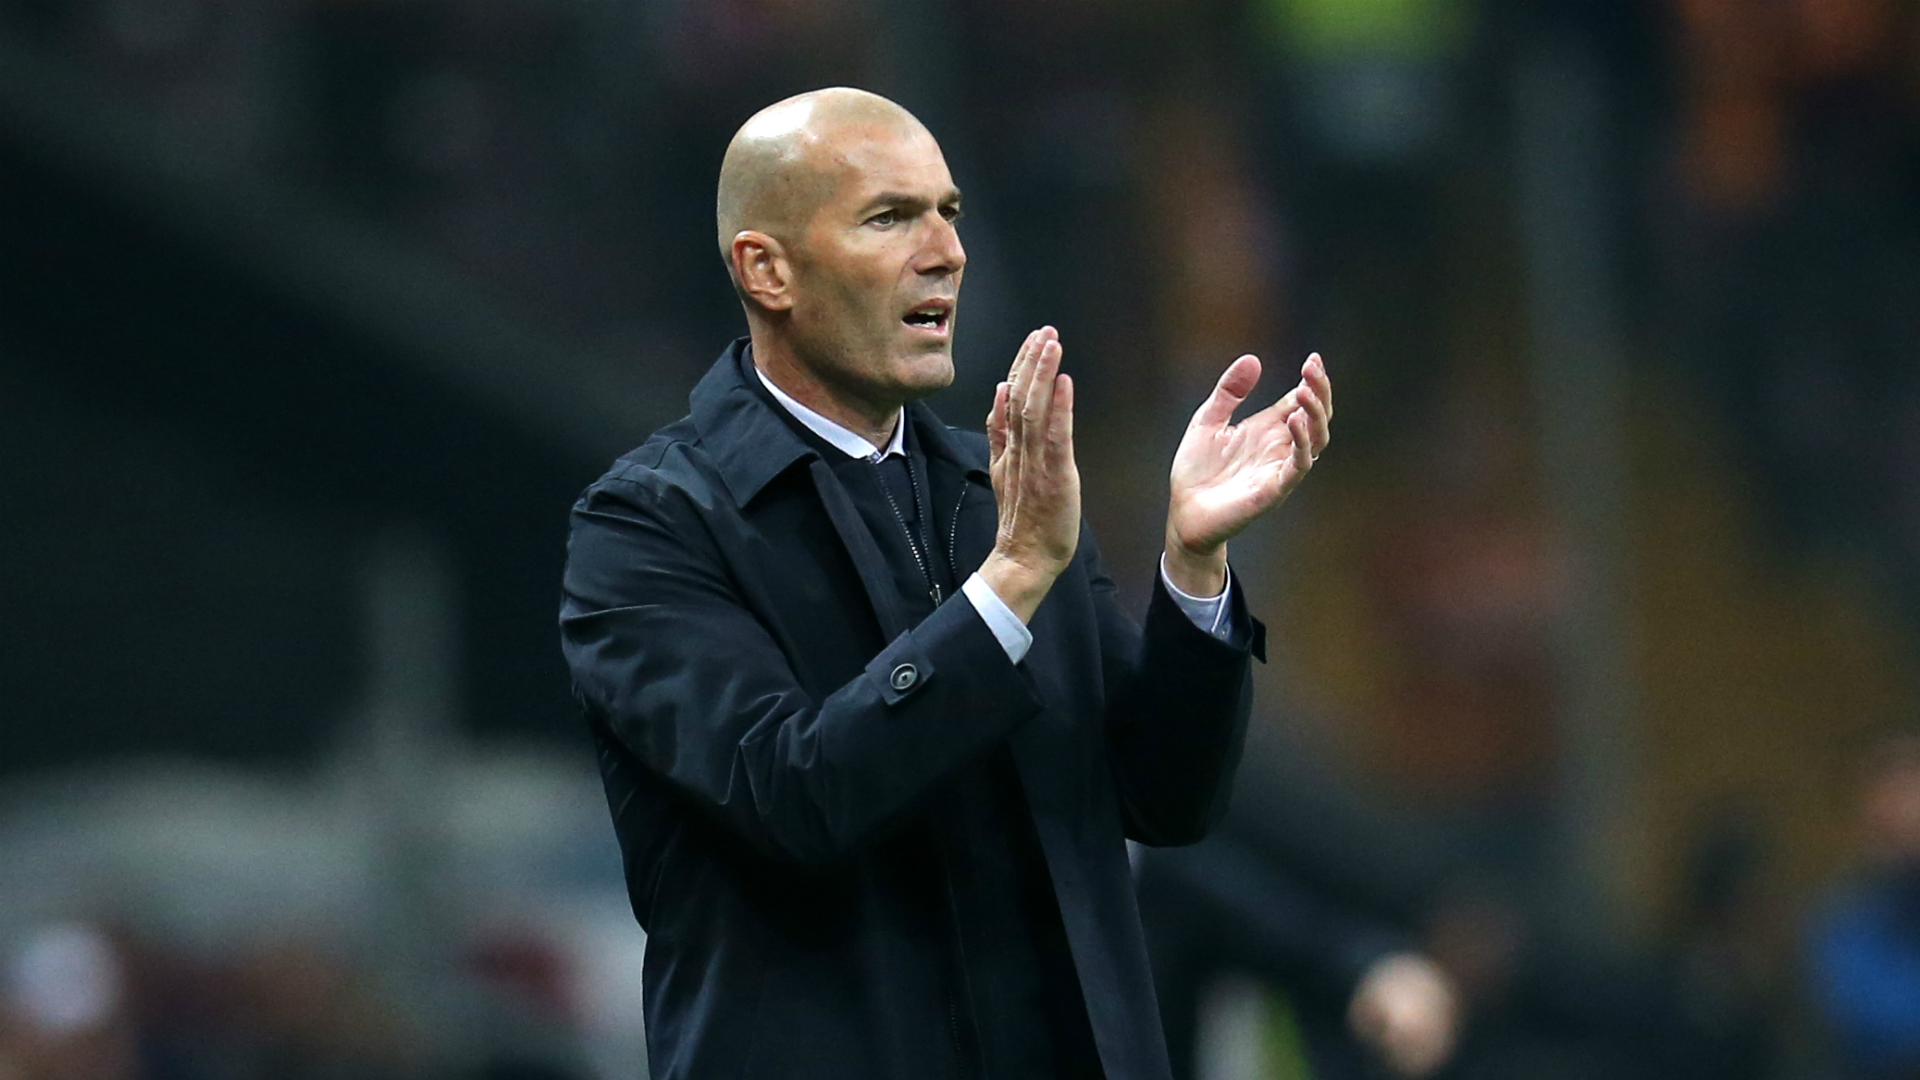 I don't have a 'Plan A' or a 'Plan B' - Zidane